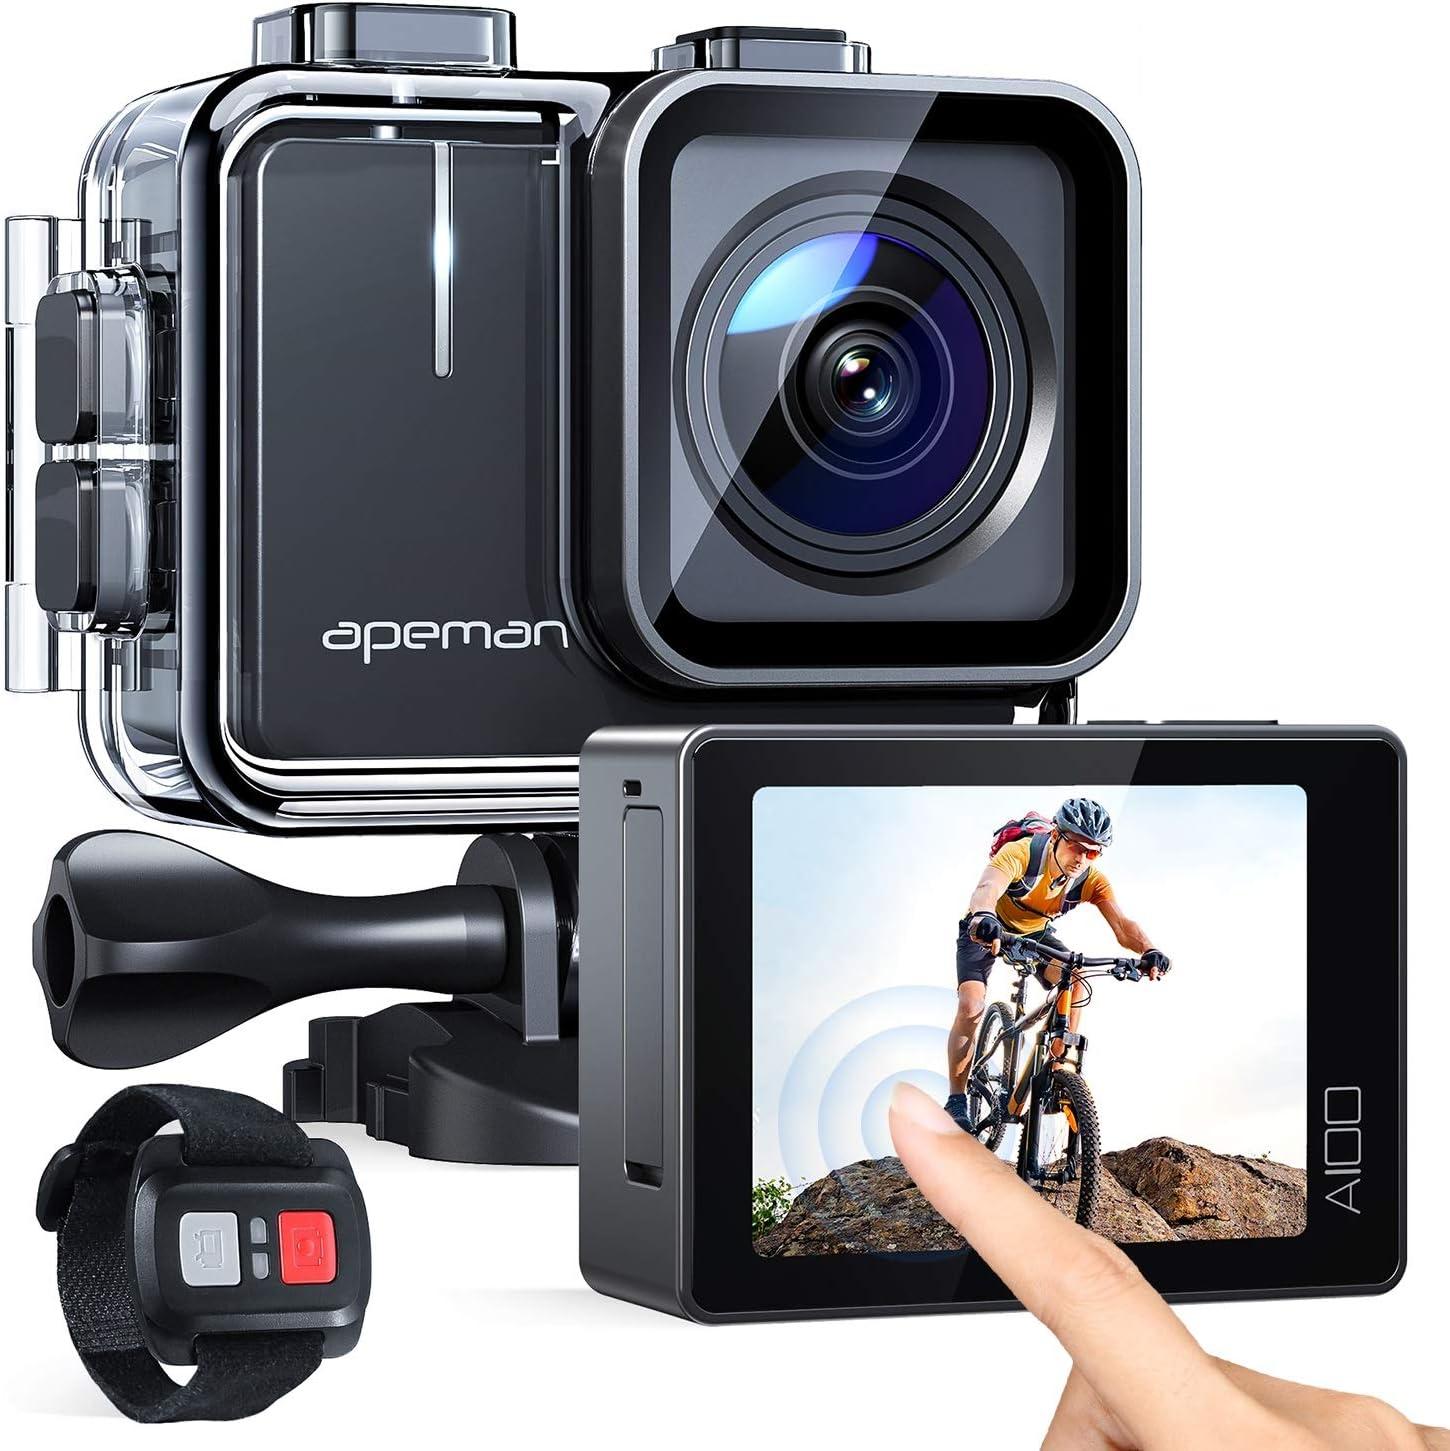 Best action camera under $100 | Apeman A100 overview